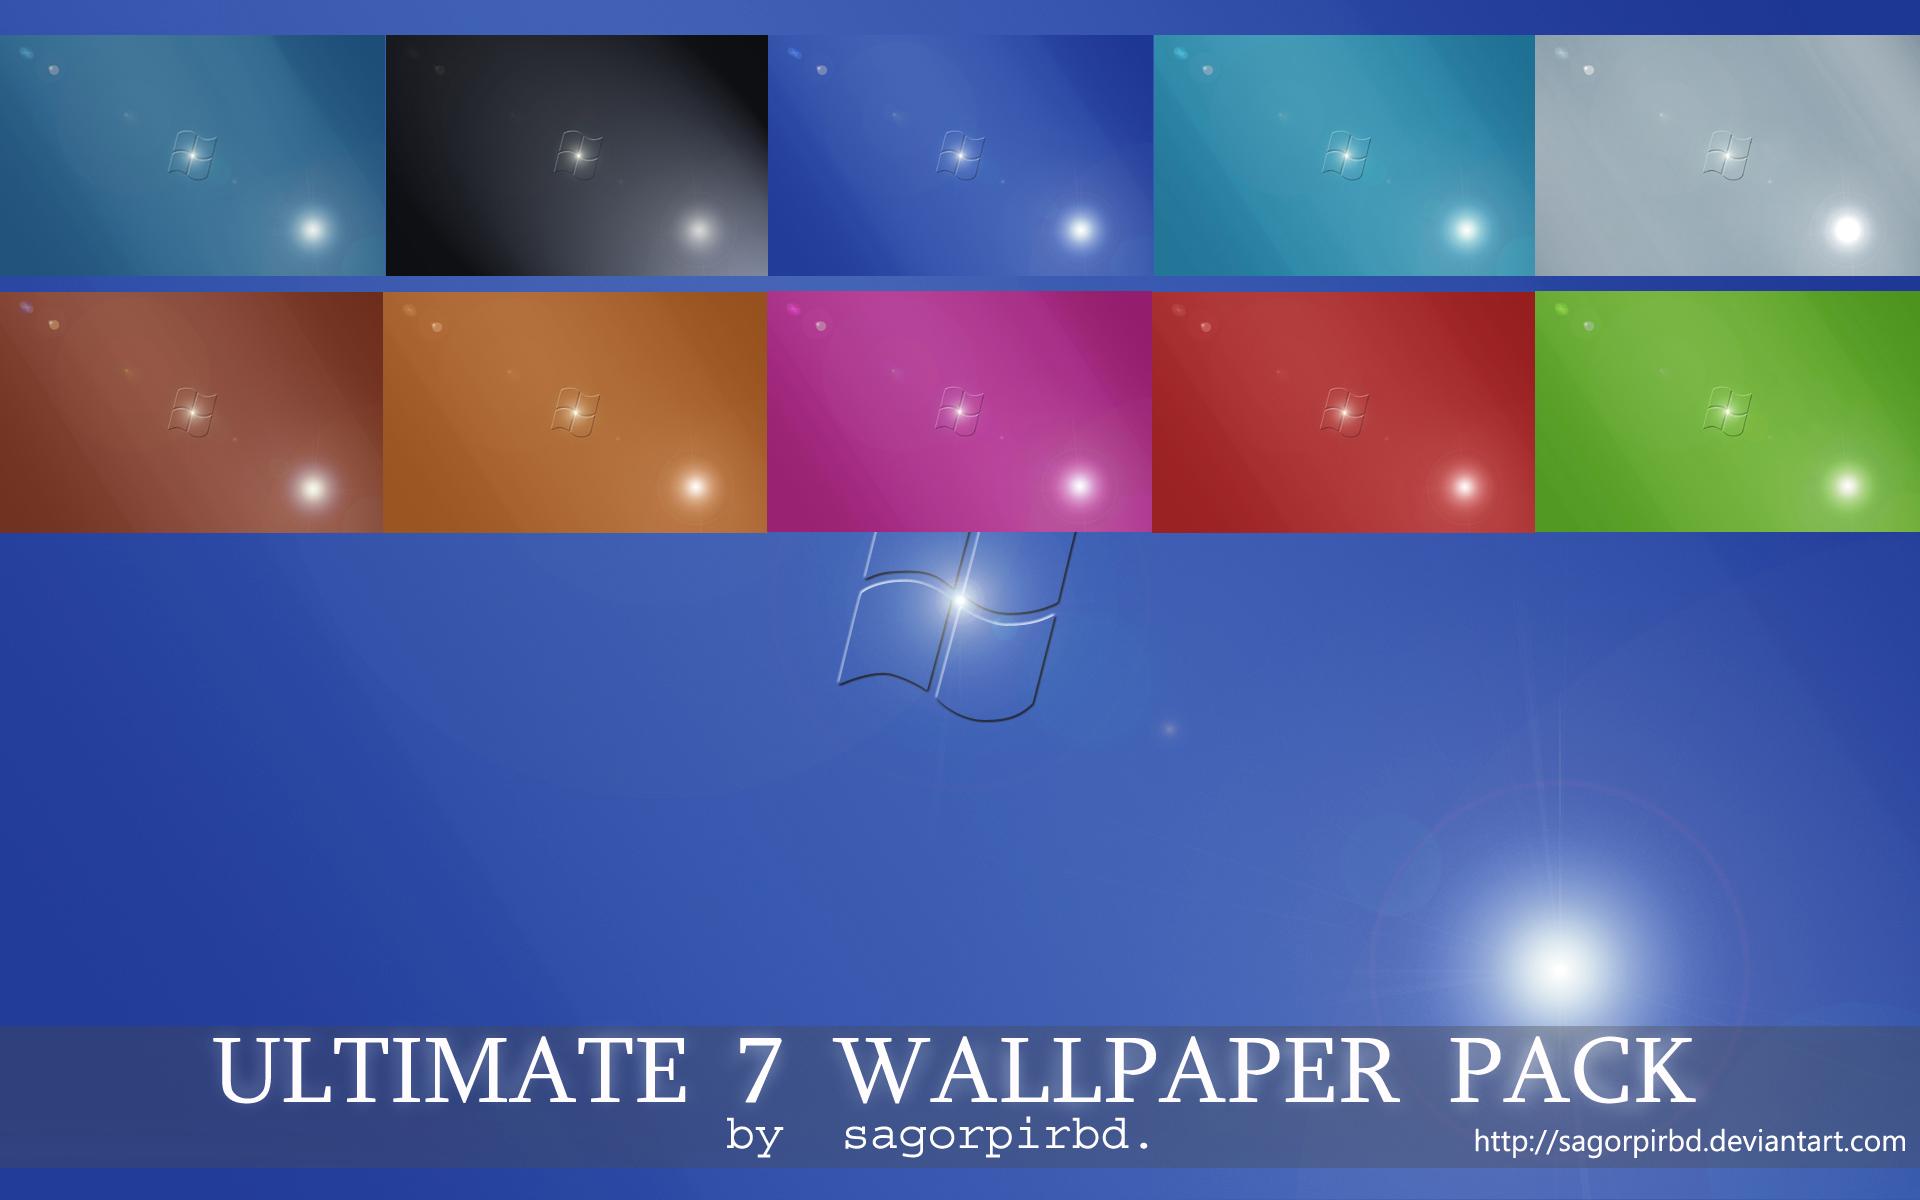 Ultimate 7 Wallpaper Pack_2 by sagorpirbd